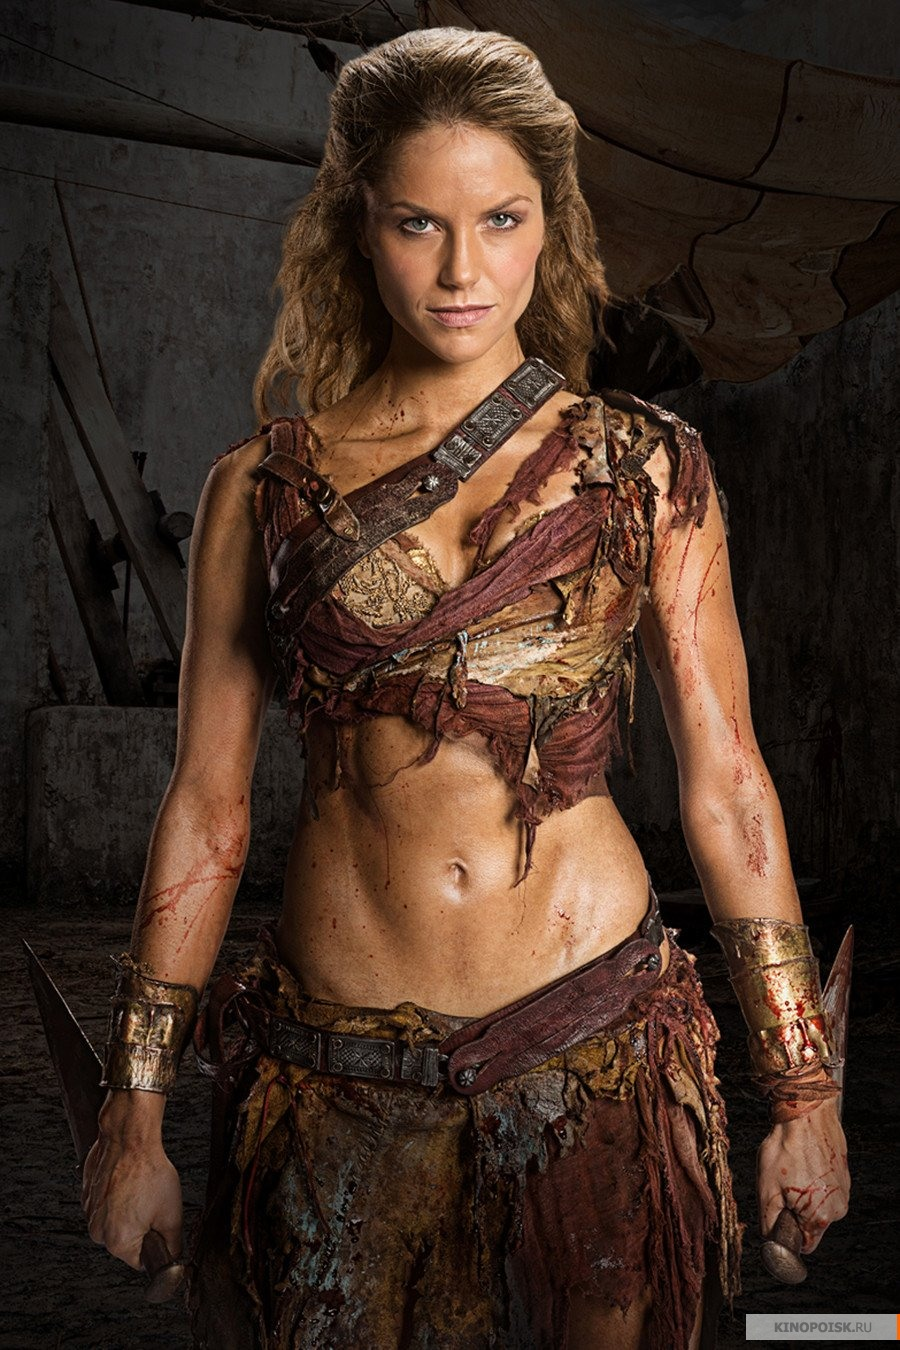 Gladiator eroticvs the lesbian warriors sex scene